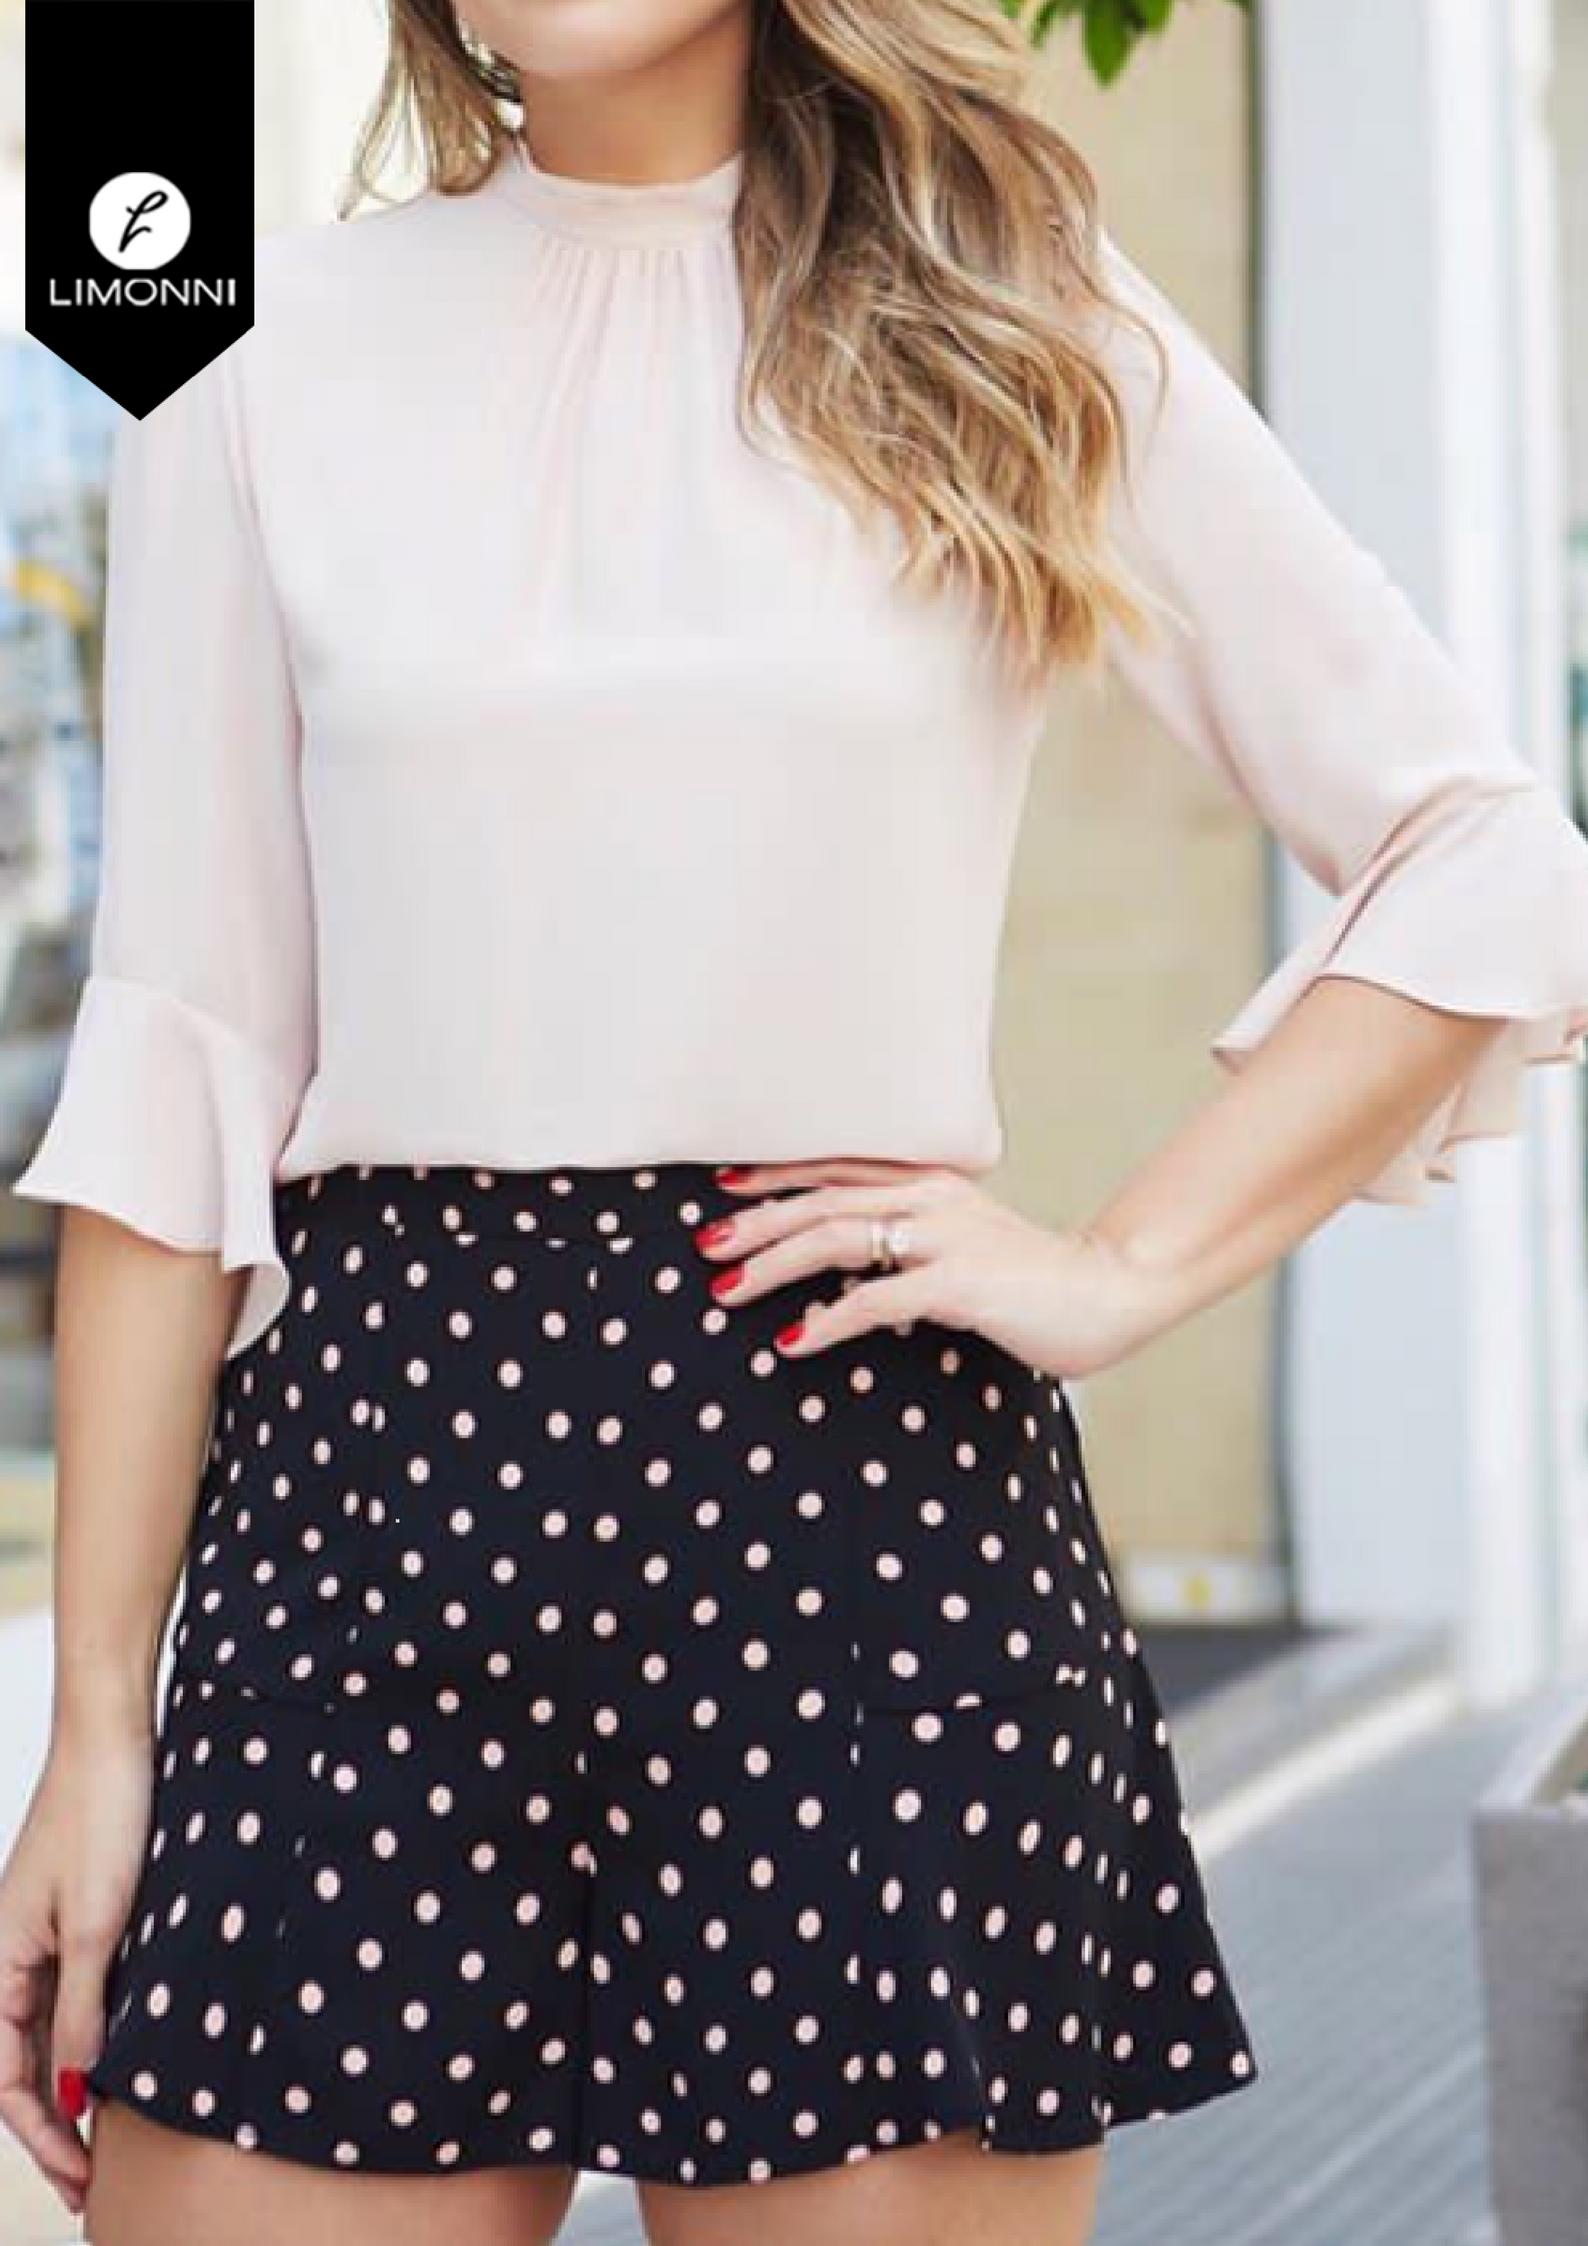 Blusas para mujer Limonni Bennett LI1401 Casuales